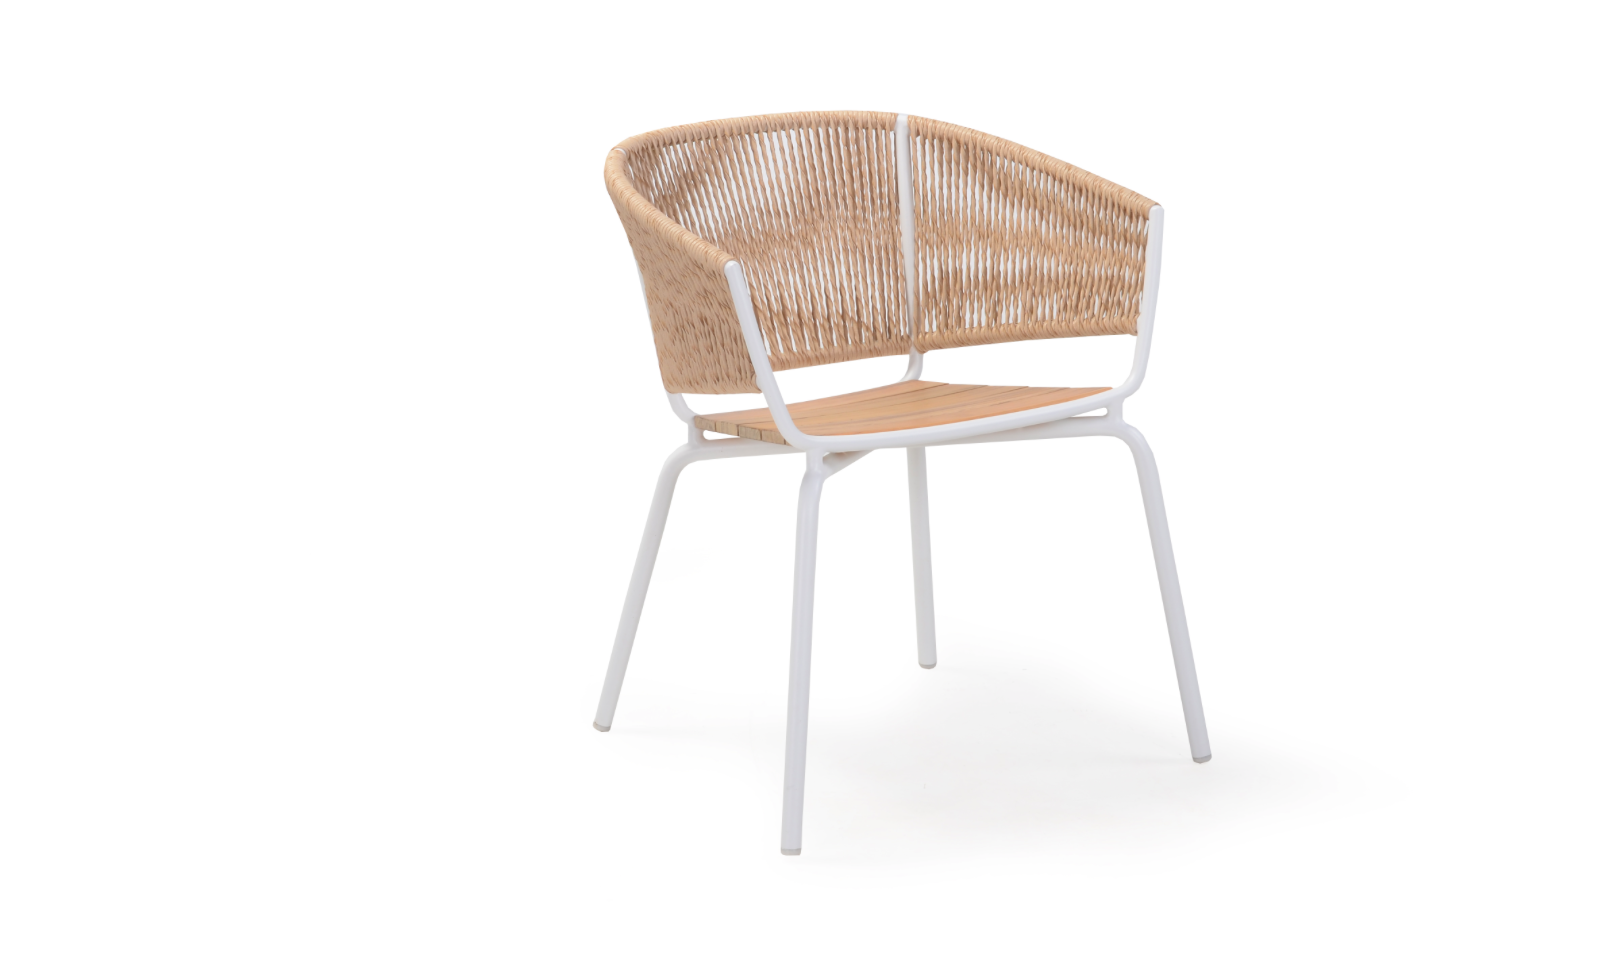 Modern Weave Rope Dining Chair Luxury Teak Organic Hand Woven